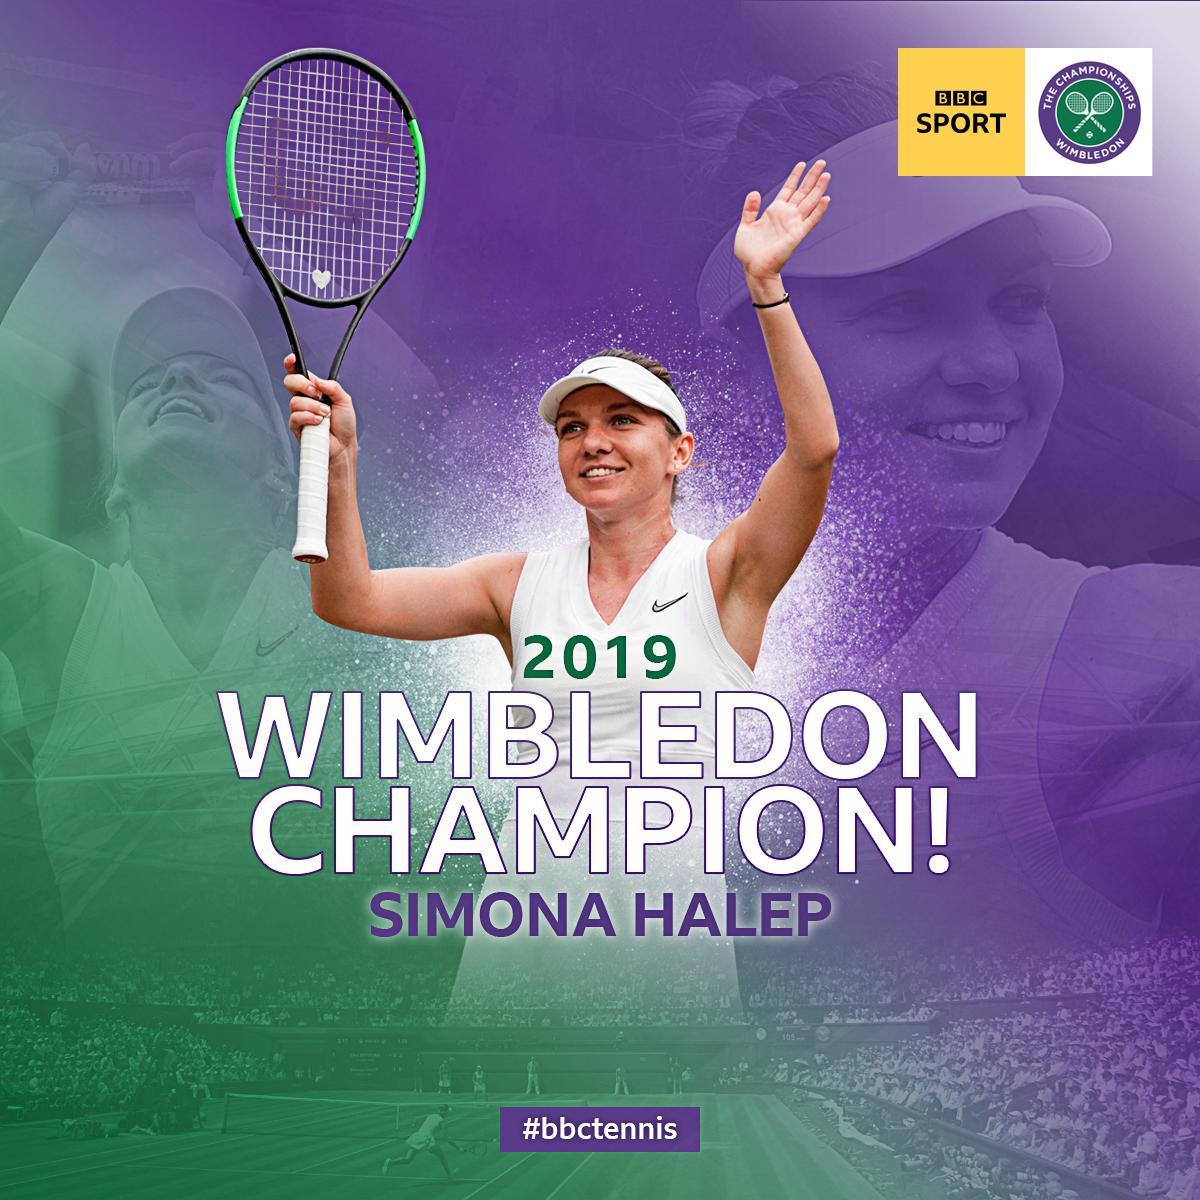 Simona Halep just blew Serena Williams